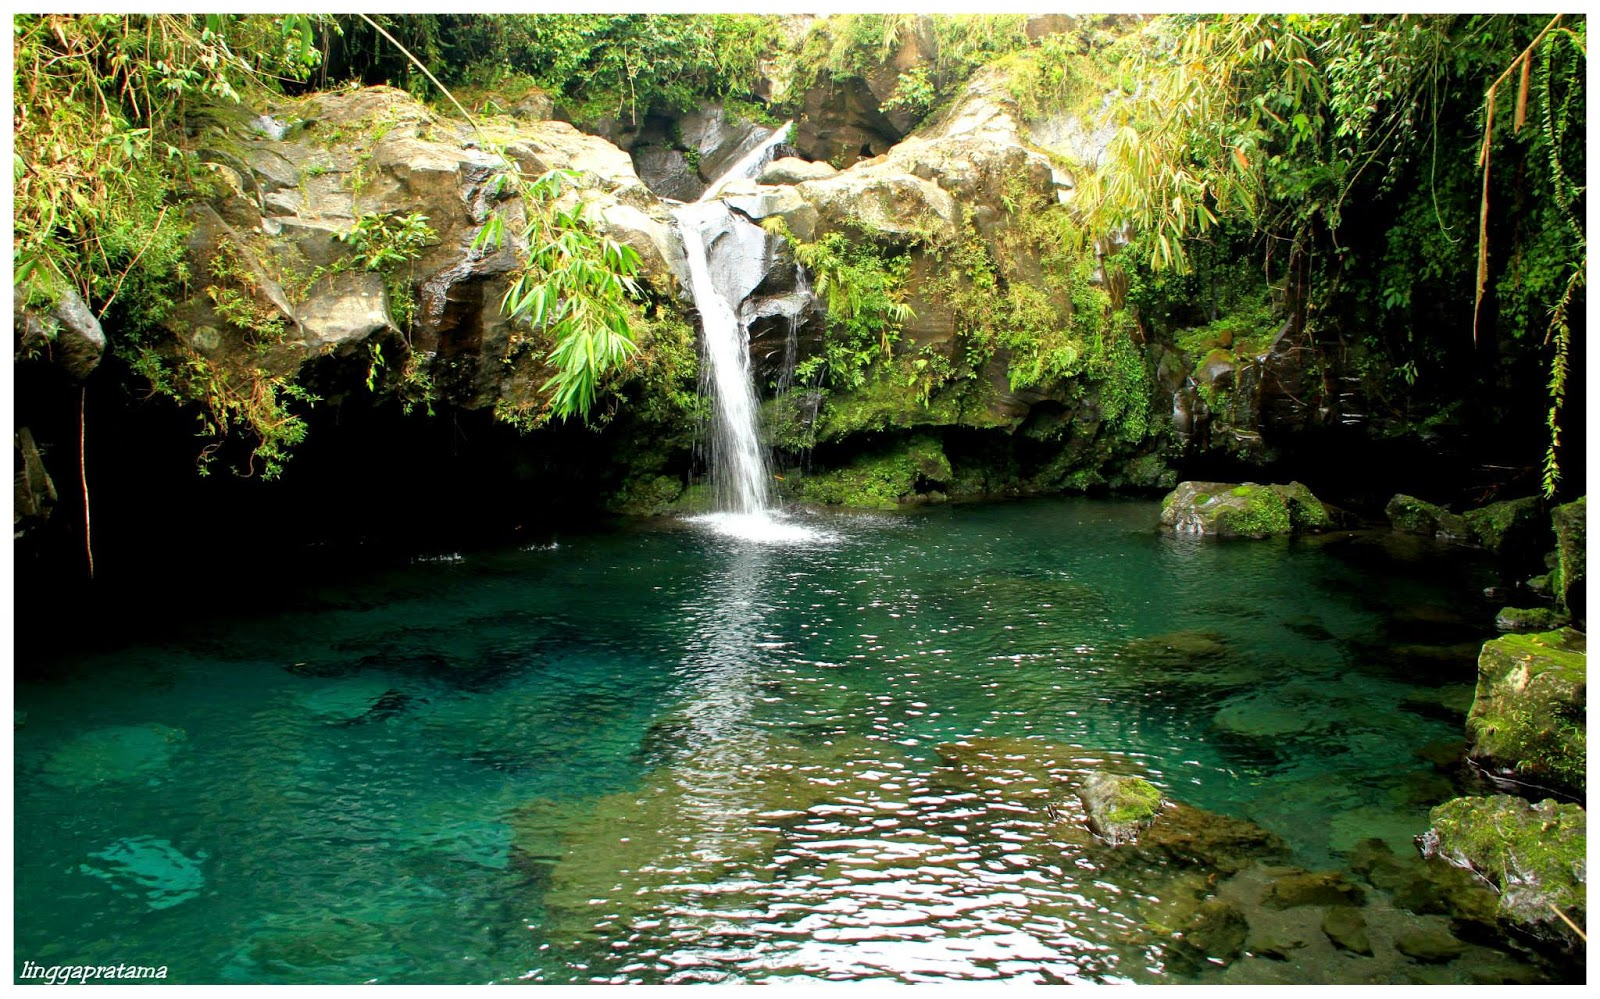 Daftar Objek Wisata Di Purwokerto Jawa Tengah Yang Menarik